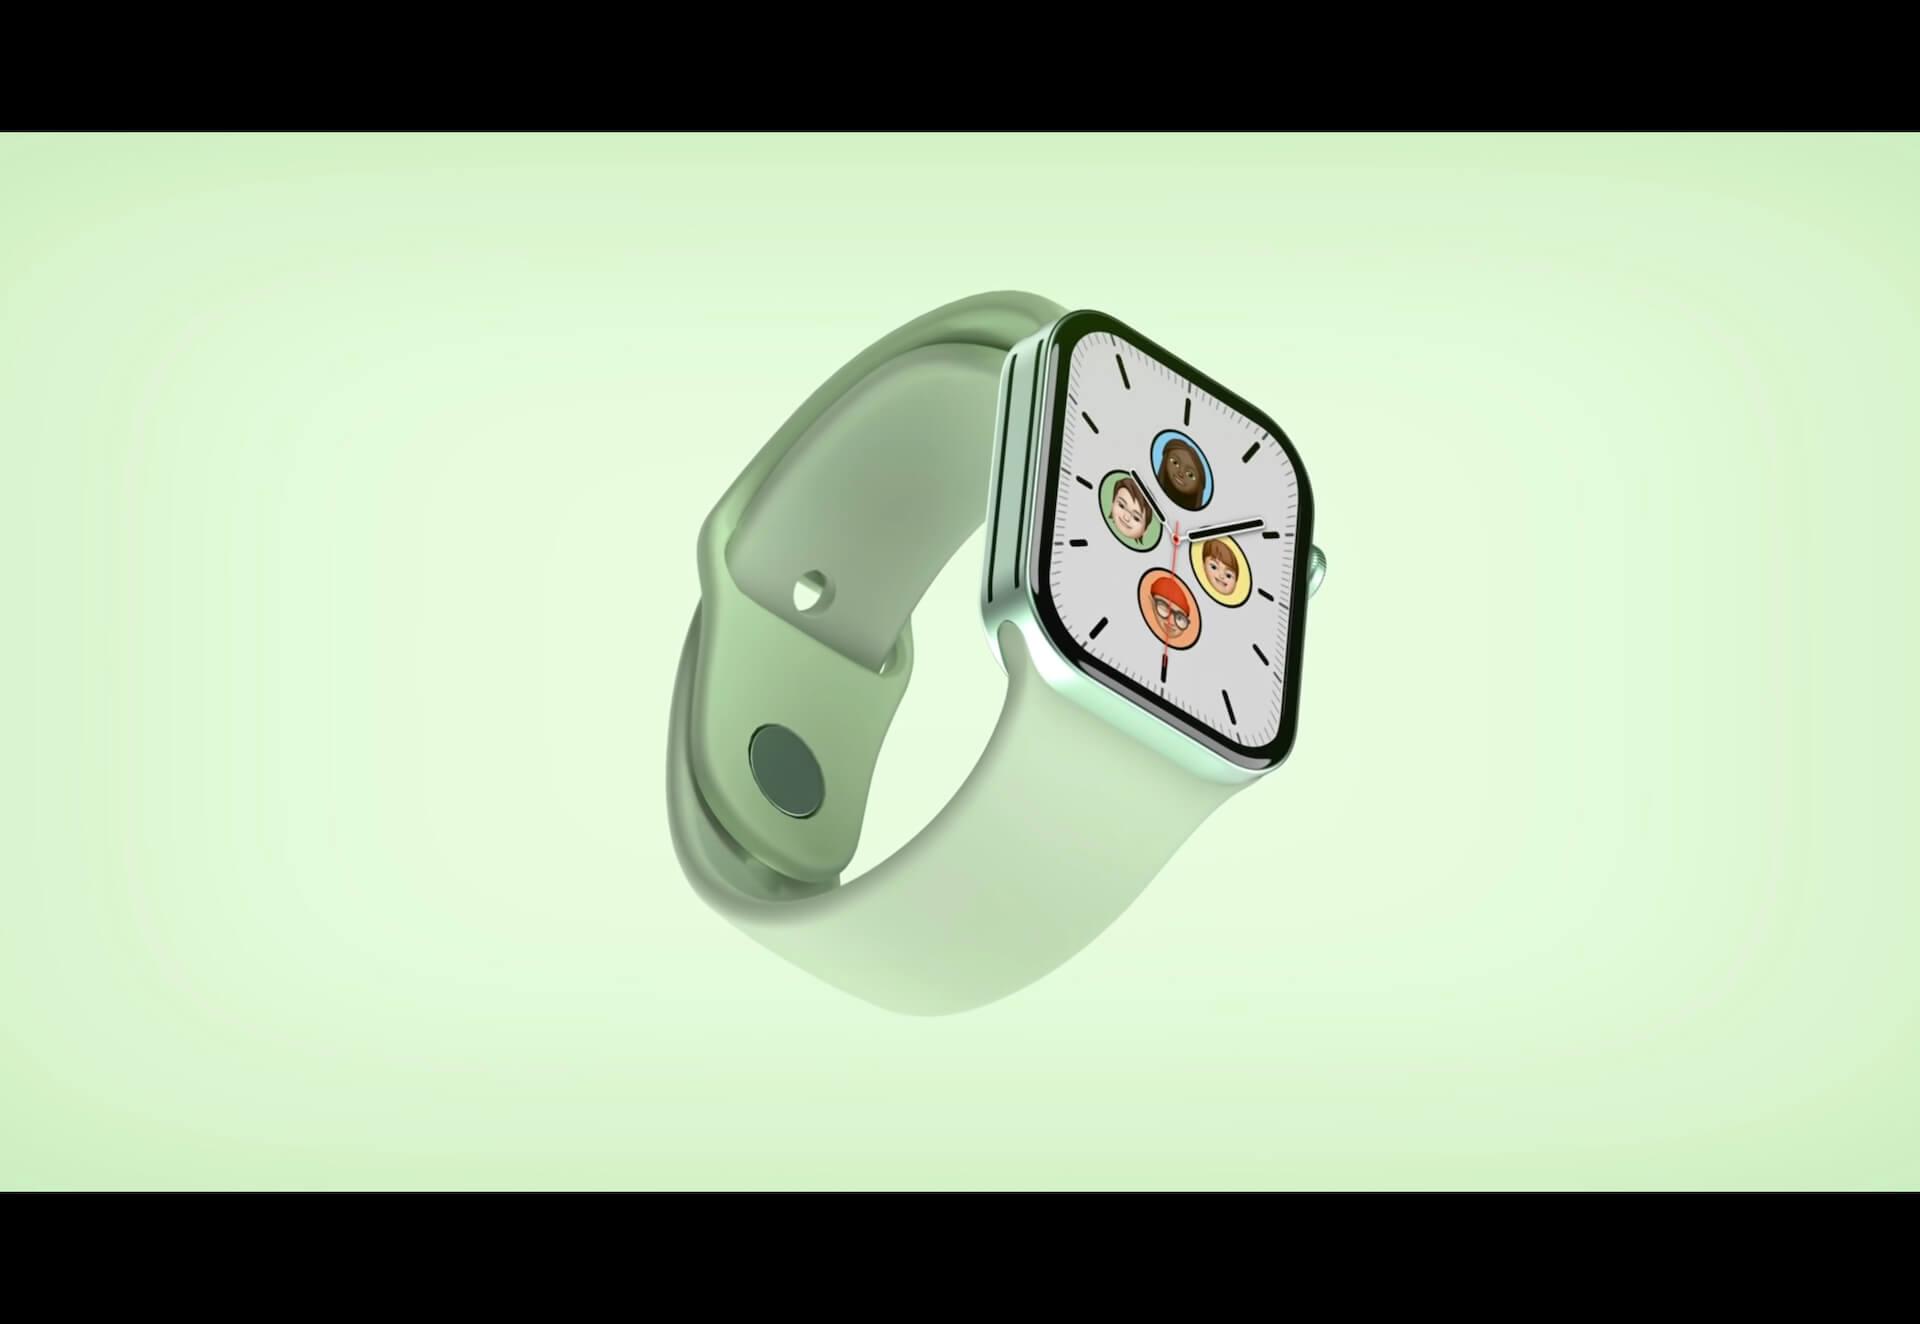 Apple Watch Series 7はやはり今月末に発売か?デザインが著しく変更される可能性 tech210910_applewatch7_main